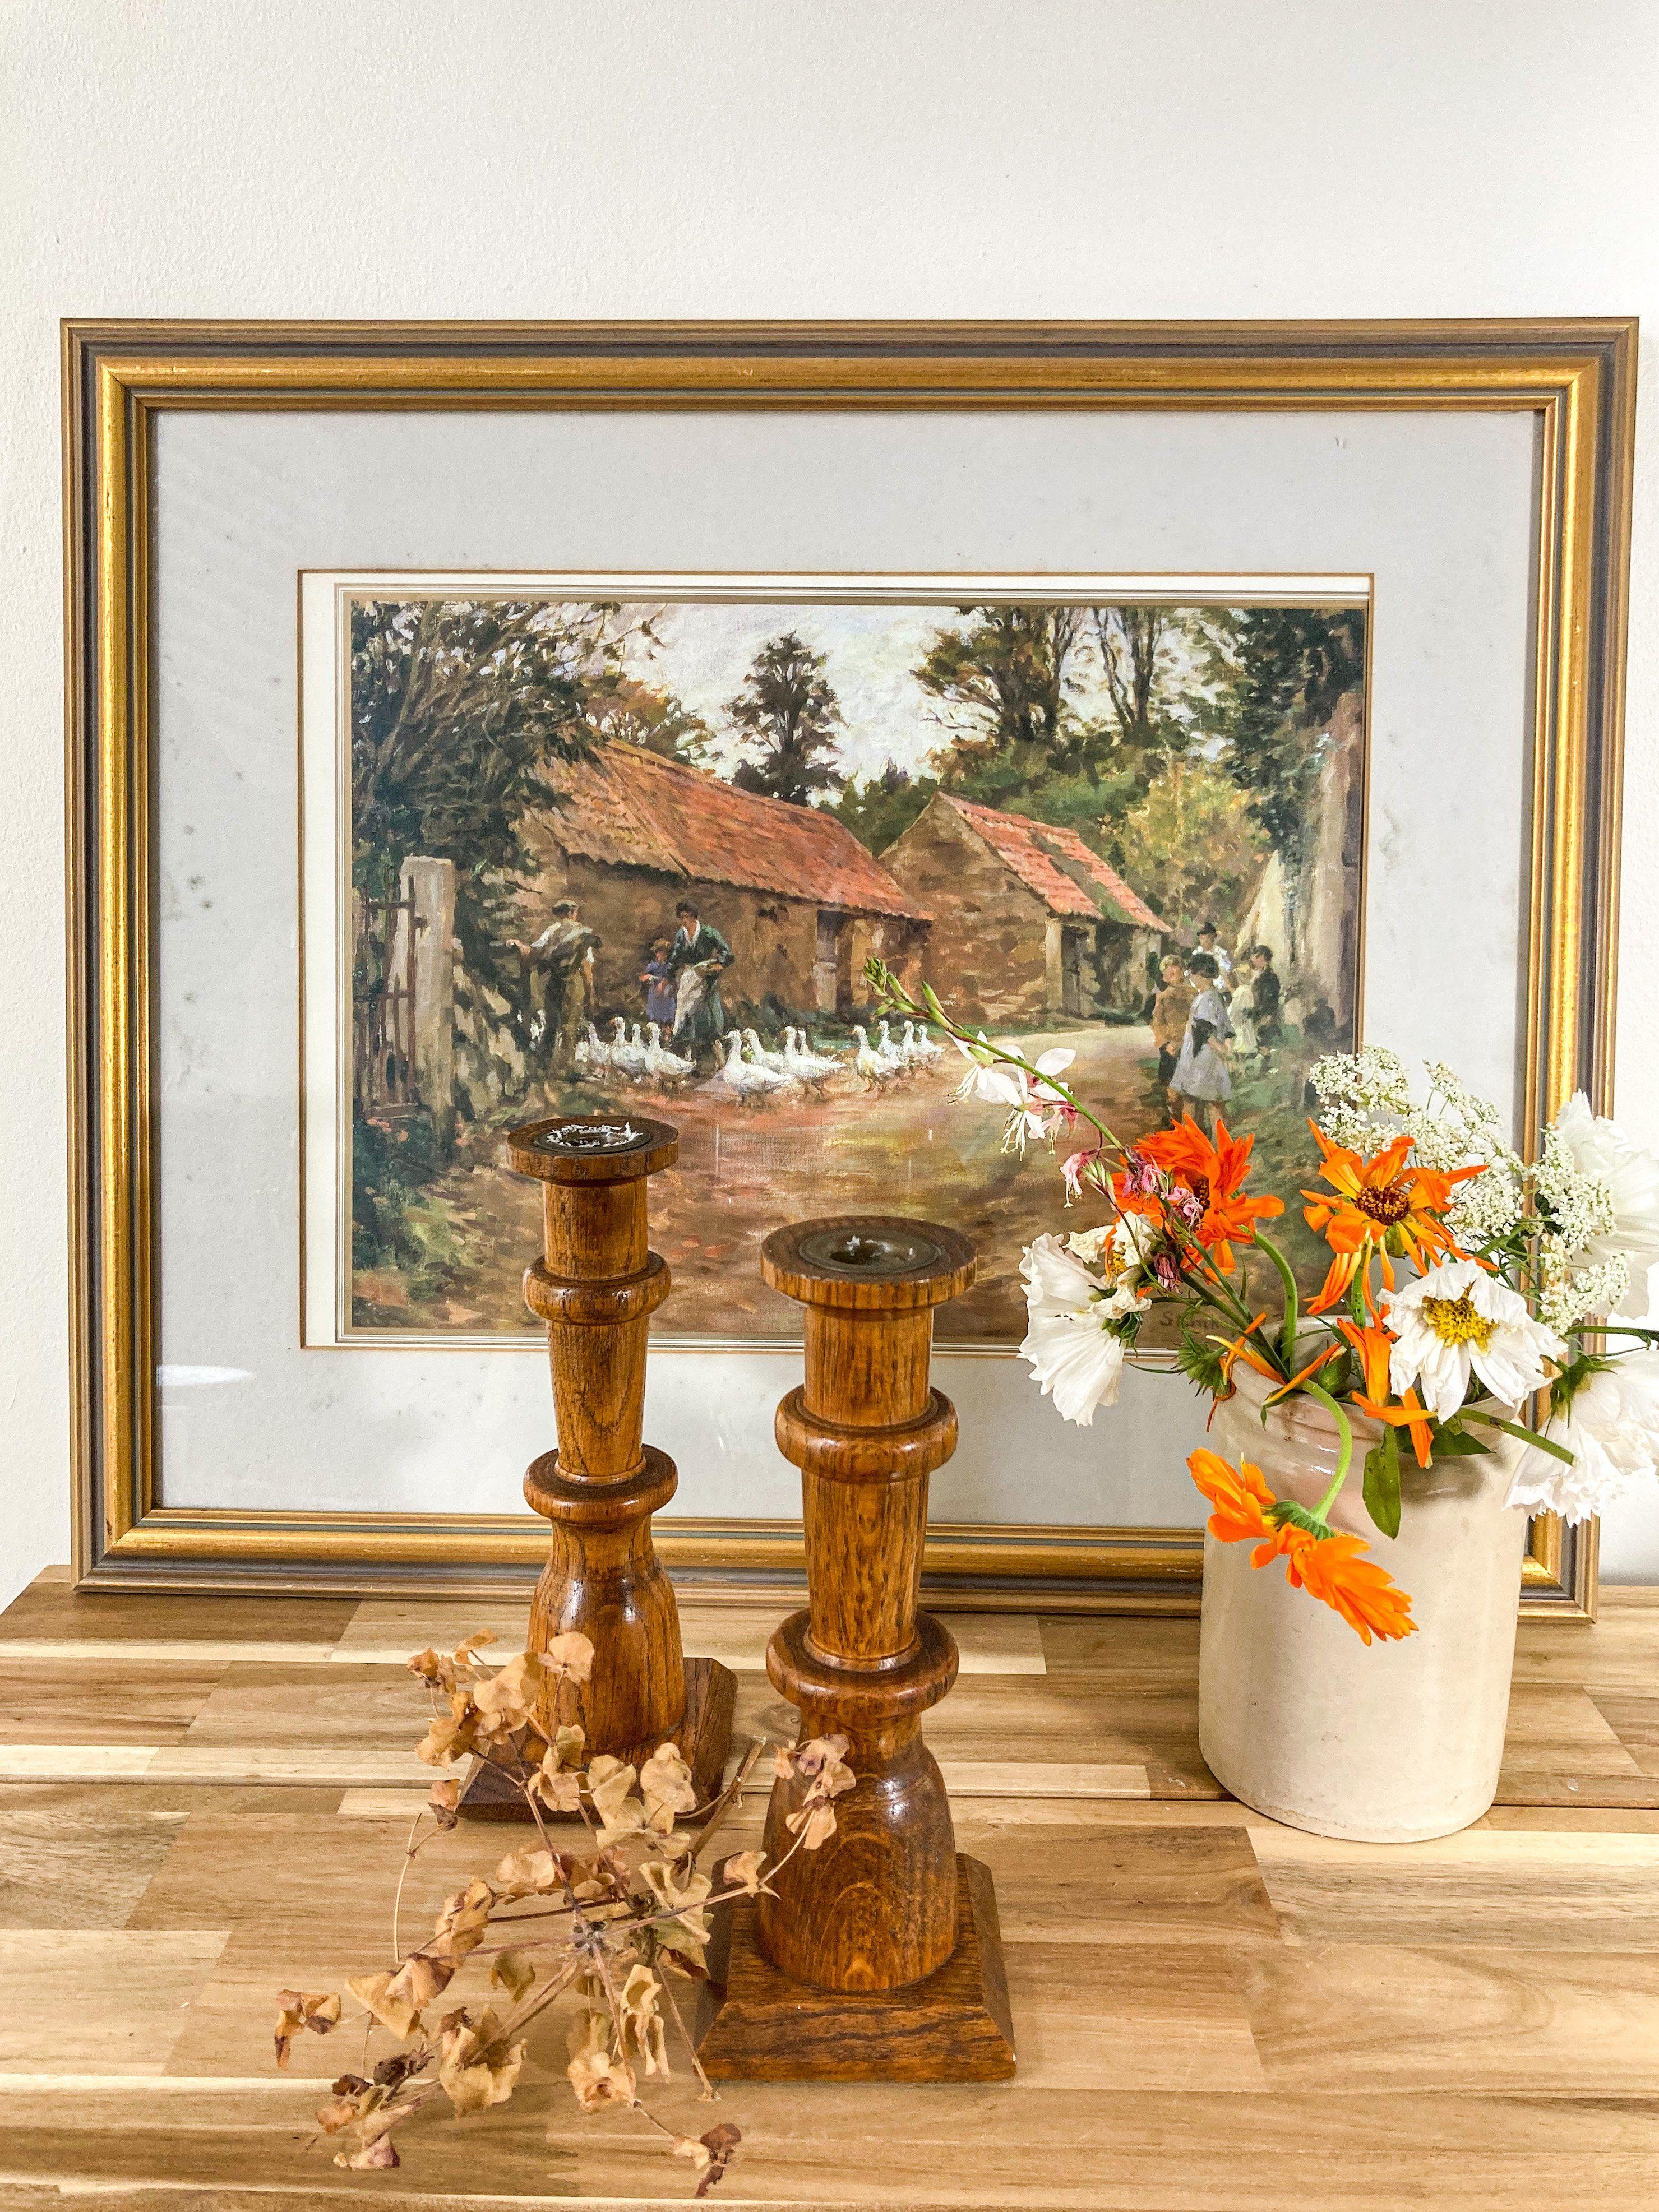 Framed Print: Stanhope A Forbes